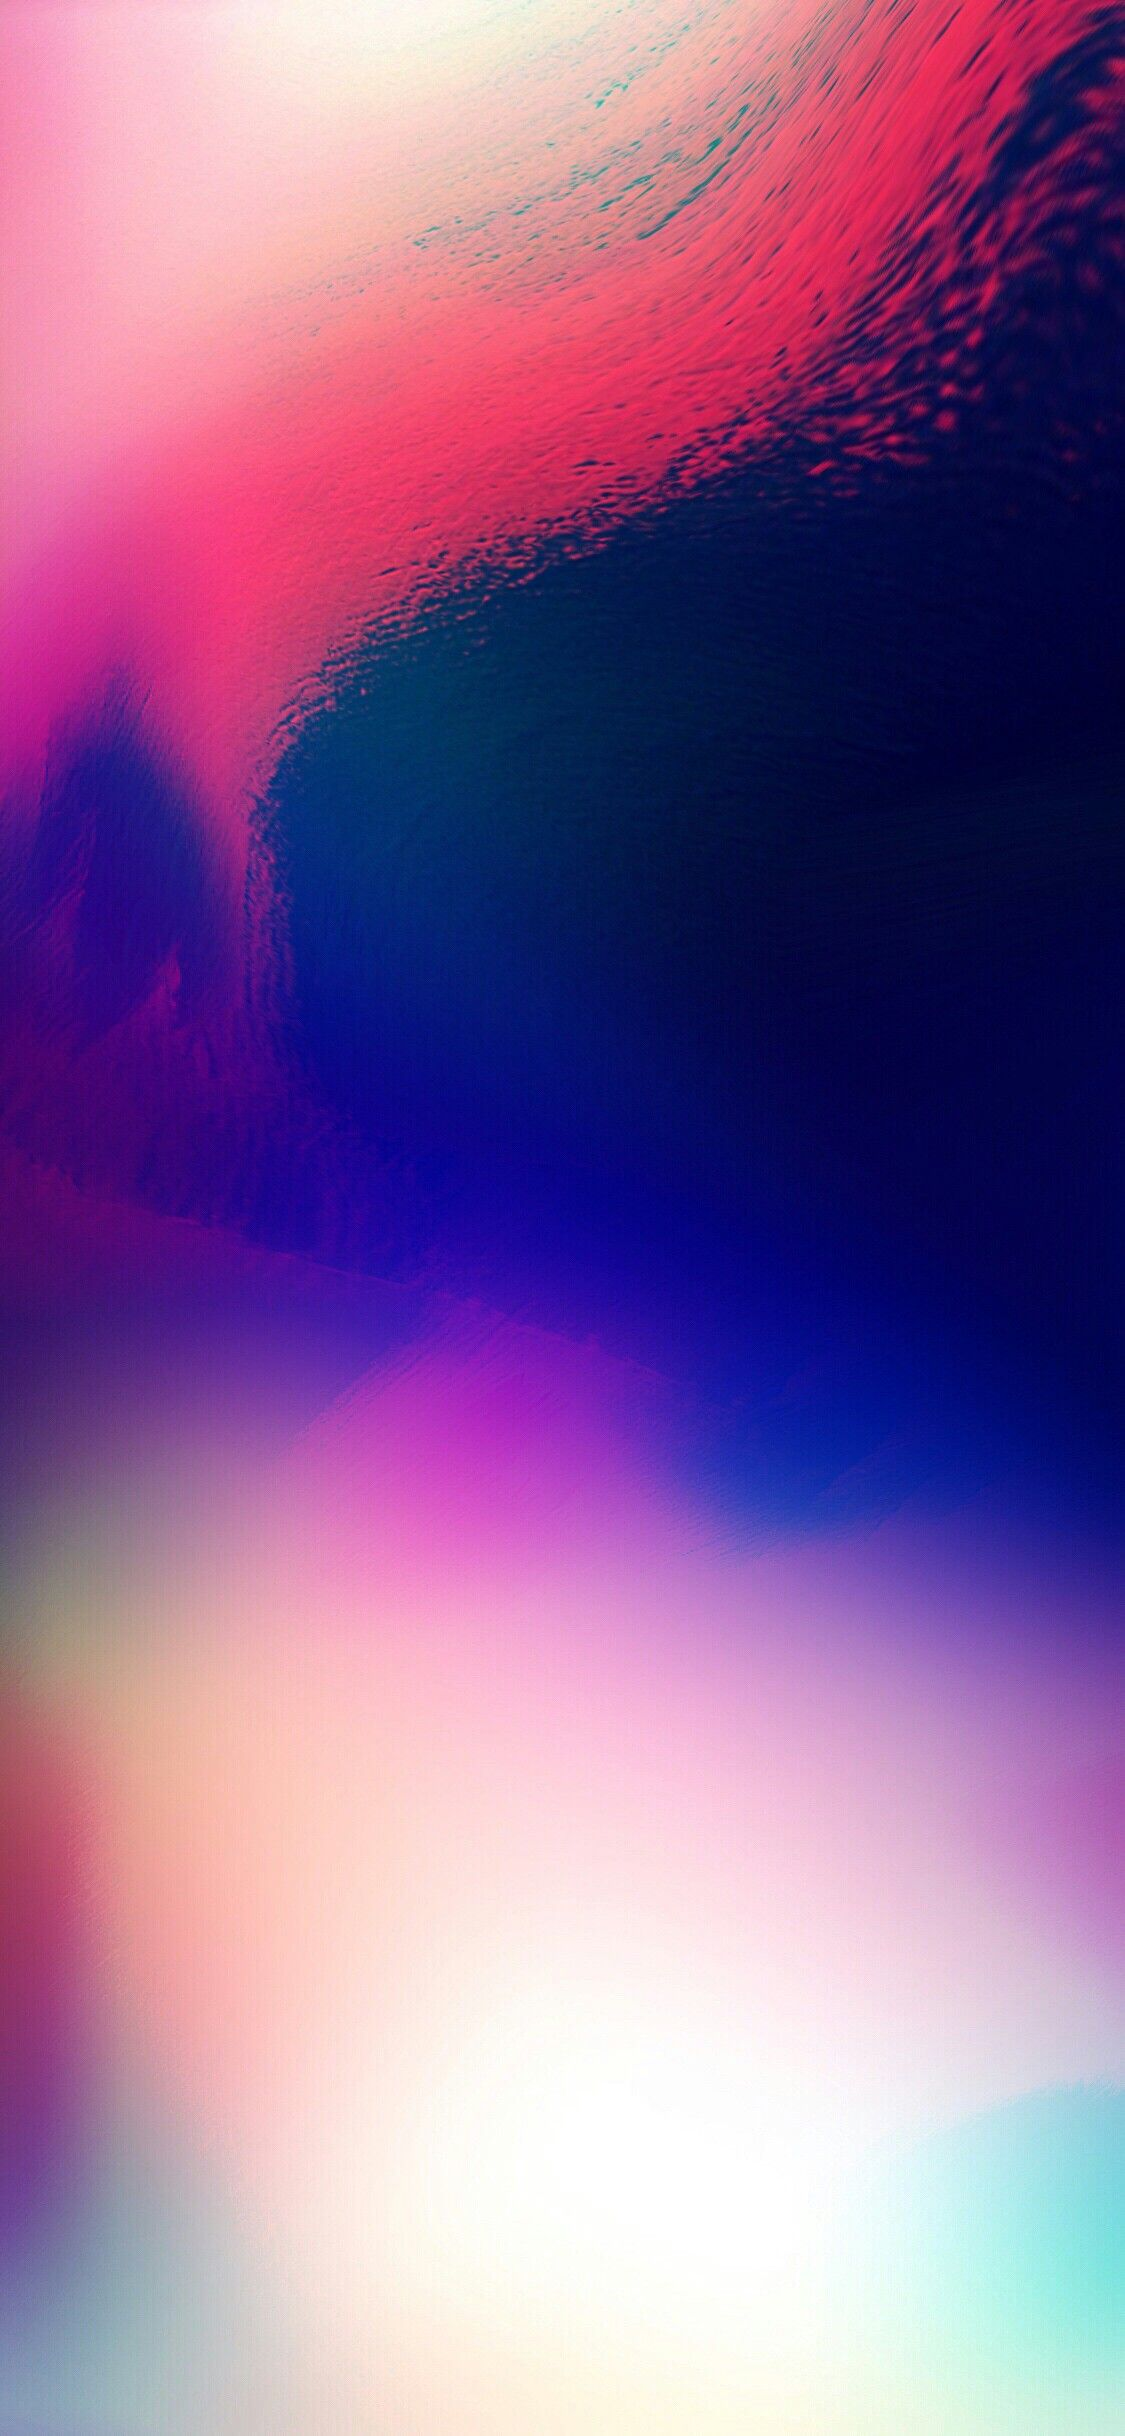 Iphone Iphonex Wallpaper Sfondi Best Iphone Wallpapers Pink